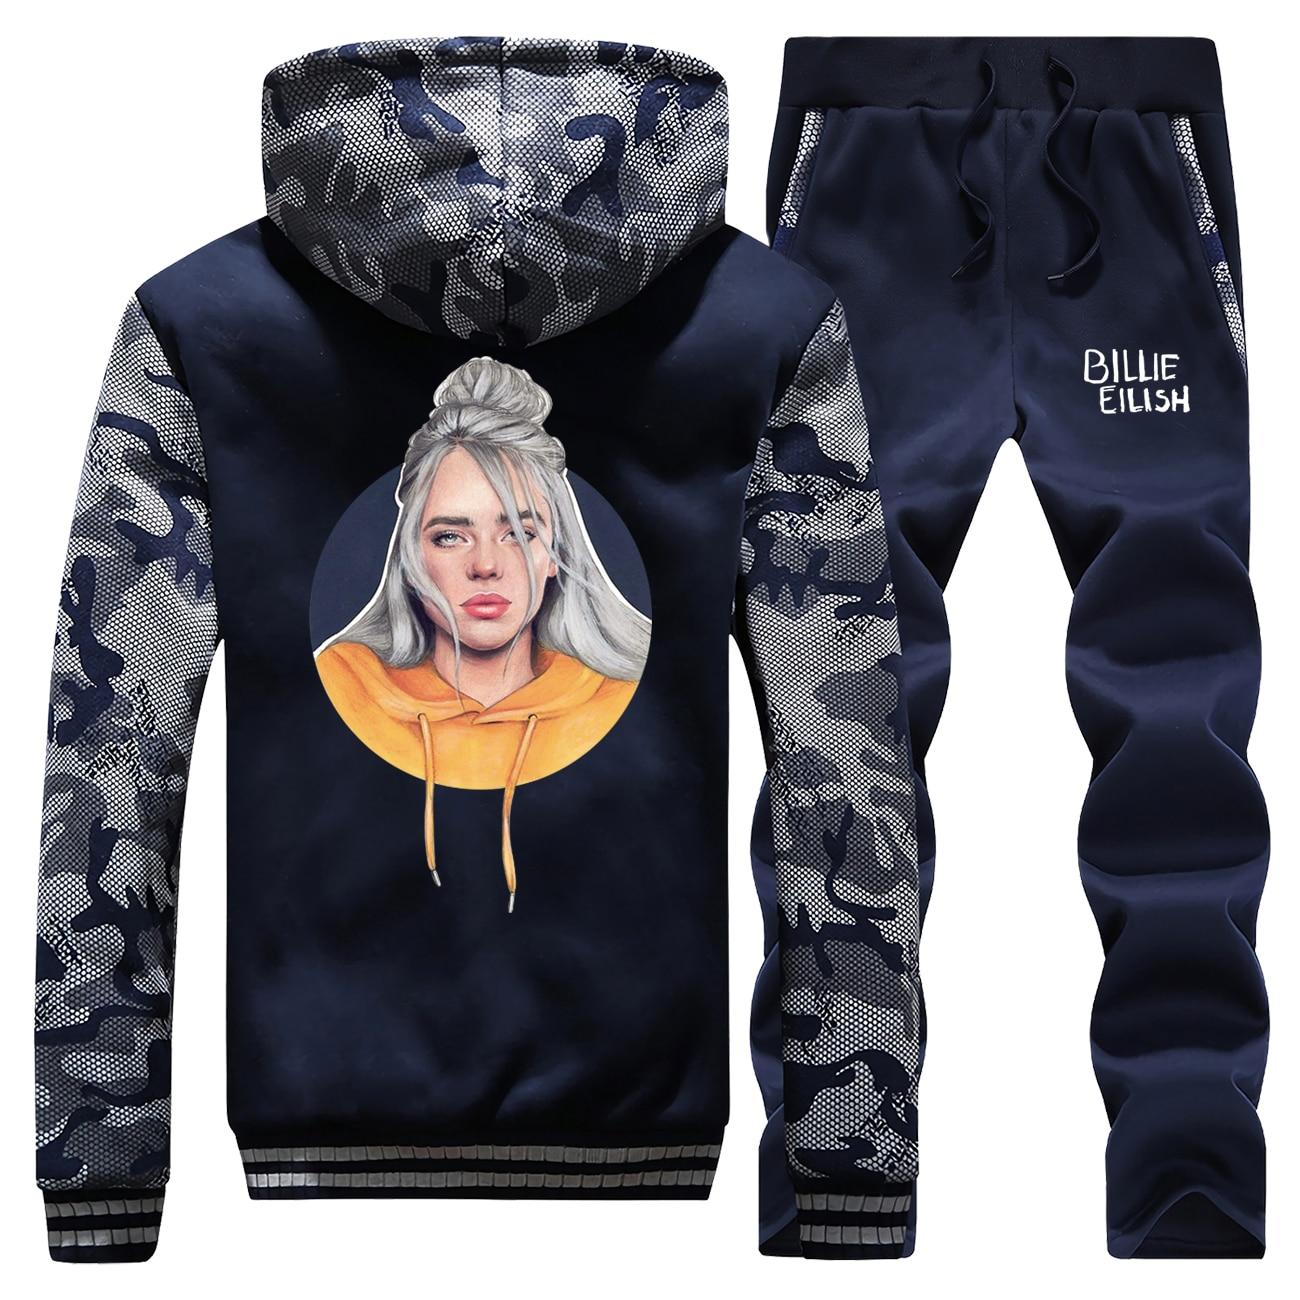 Billie Eilish Hoodie Pant Set Men Fashion Bad Guy Tracksuit Coat Kpop Streetwear Sportswear Winter Thick Jacket Camo 2 PCS Suit